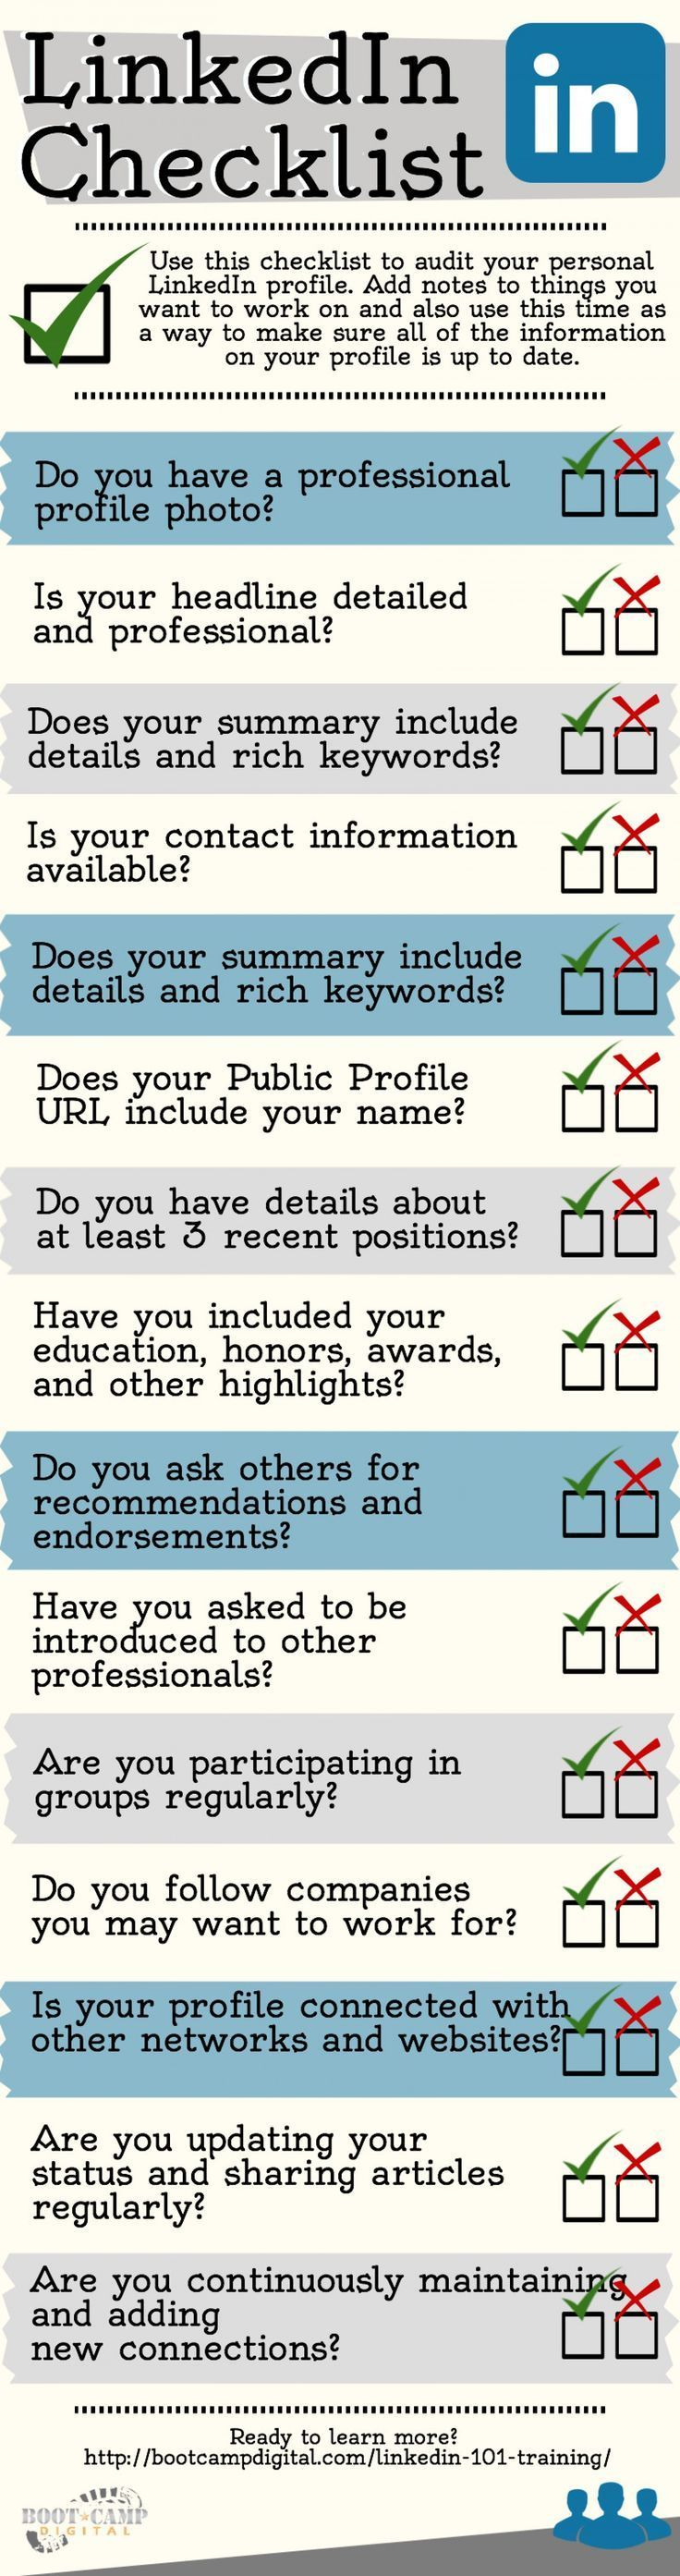 LinkedIn Checklist   Everything You Need To Build A Professional LinkedInu2026  Marketing AuditLe MarketingSocial Media ...